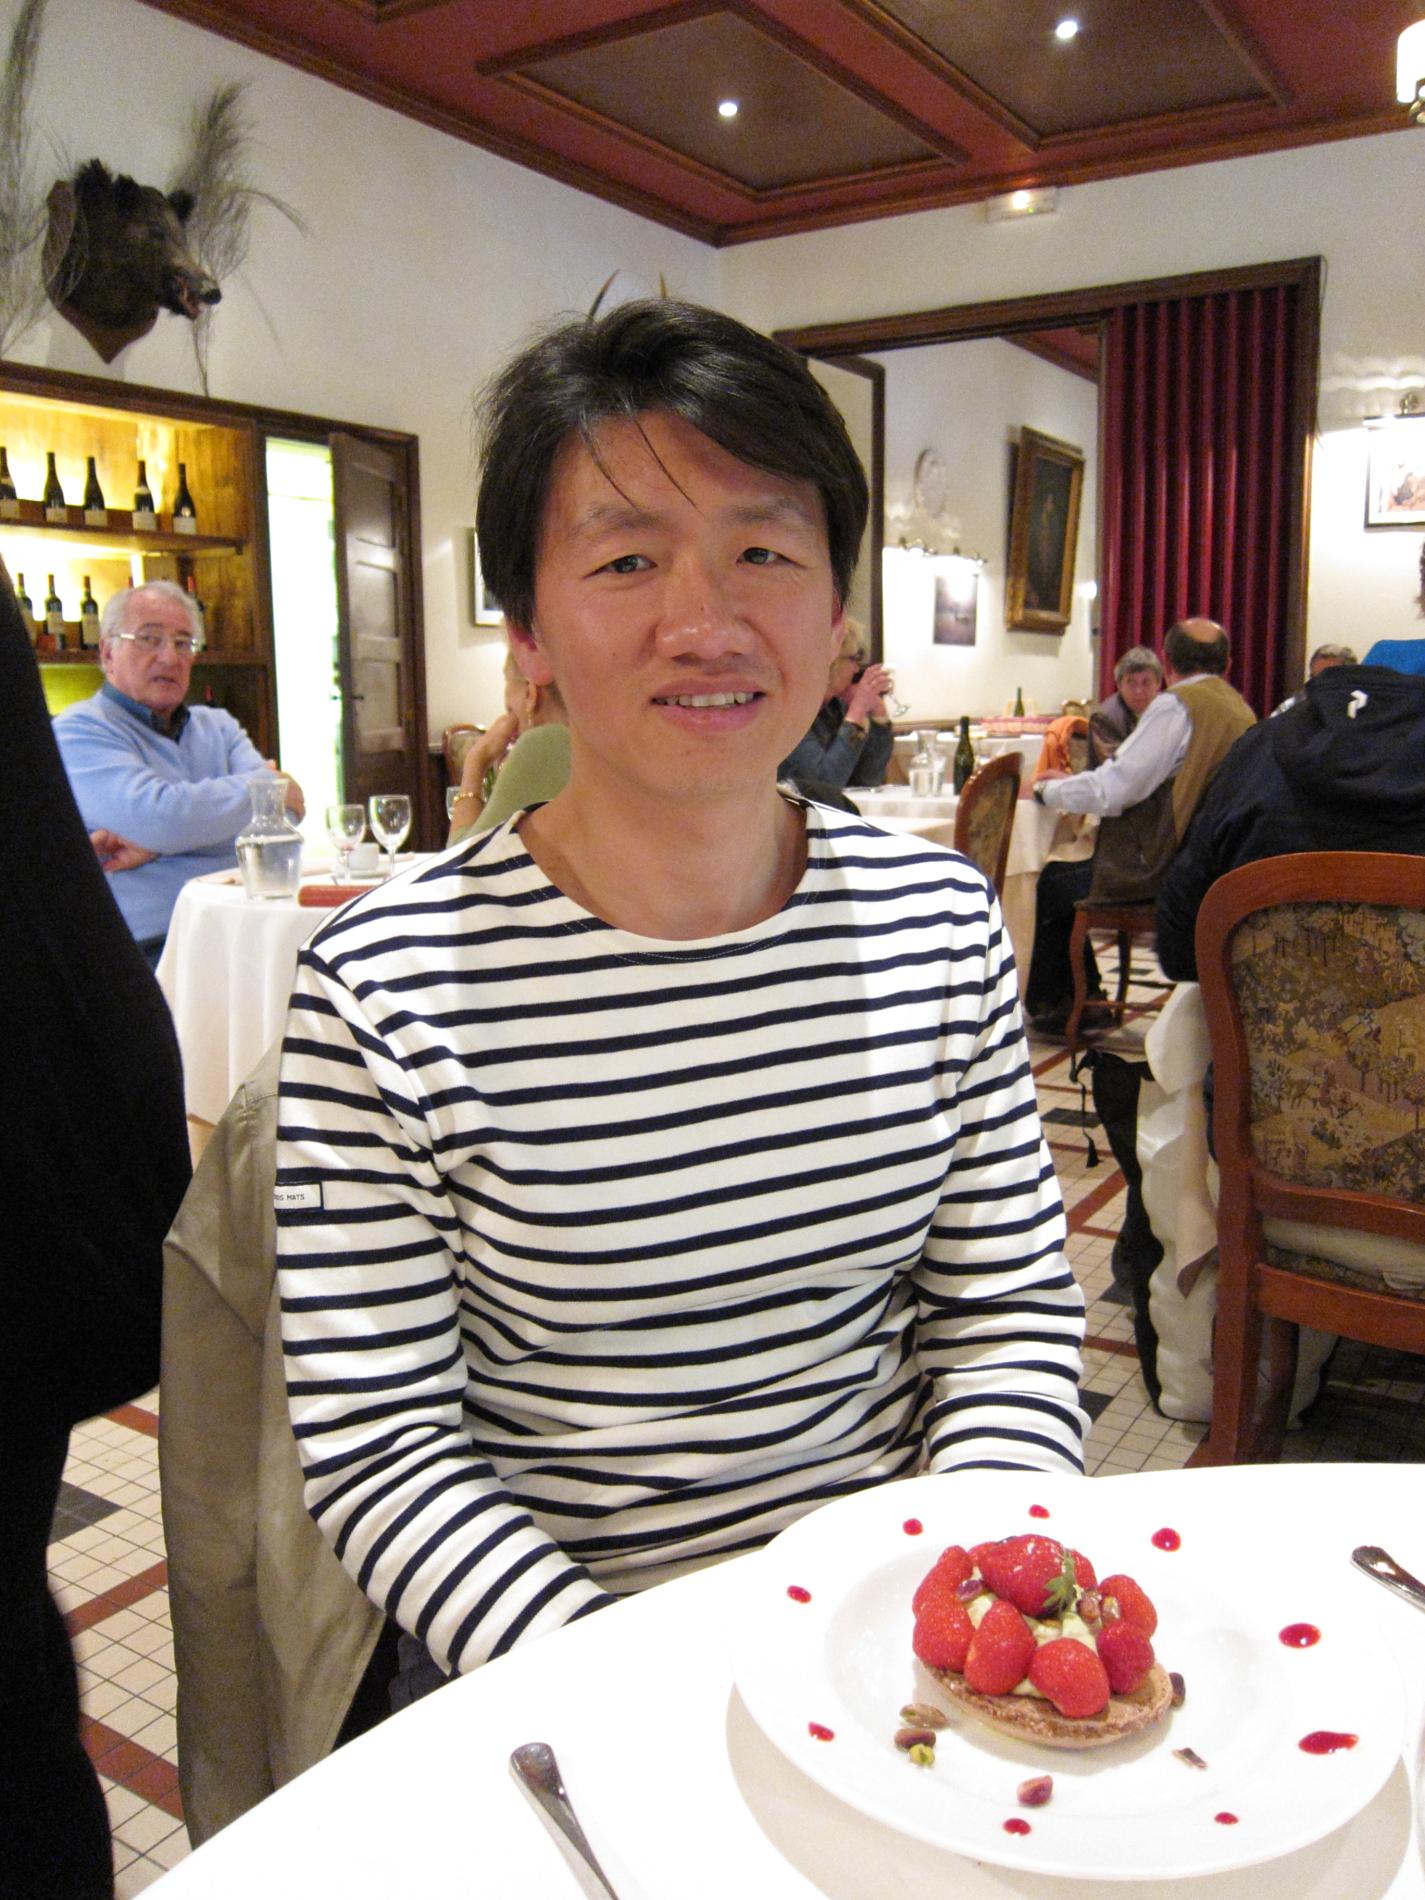 Zhizhong with his dessert at the Restaurant du Grand Saint Michel at Chambord, seemingly oblivious of the menacing sanglier looming behind him!